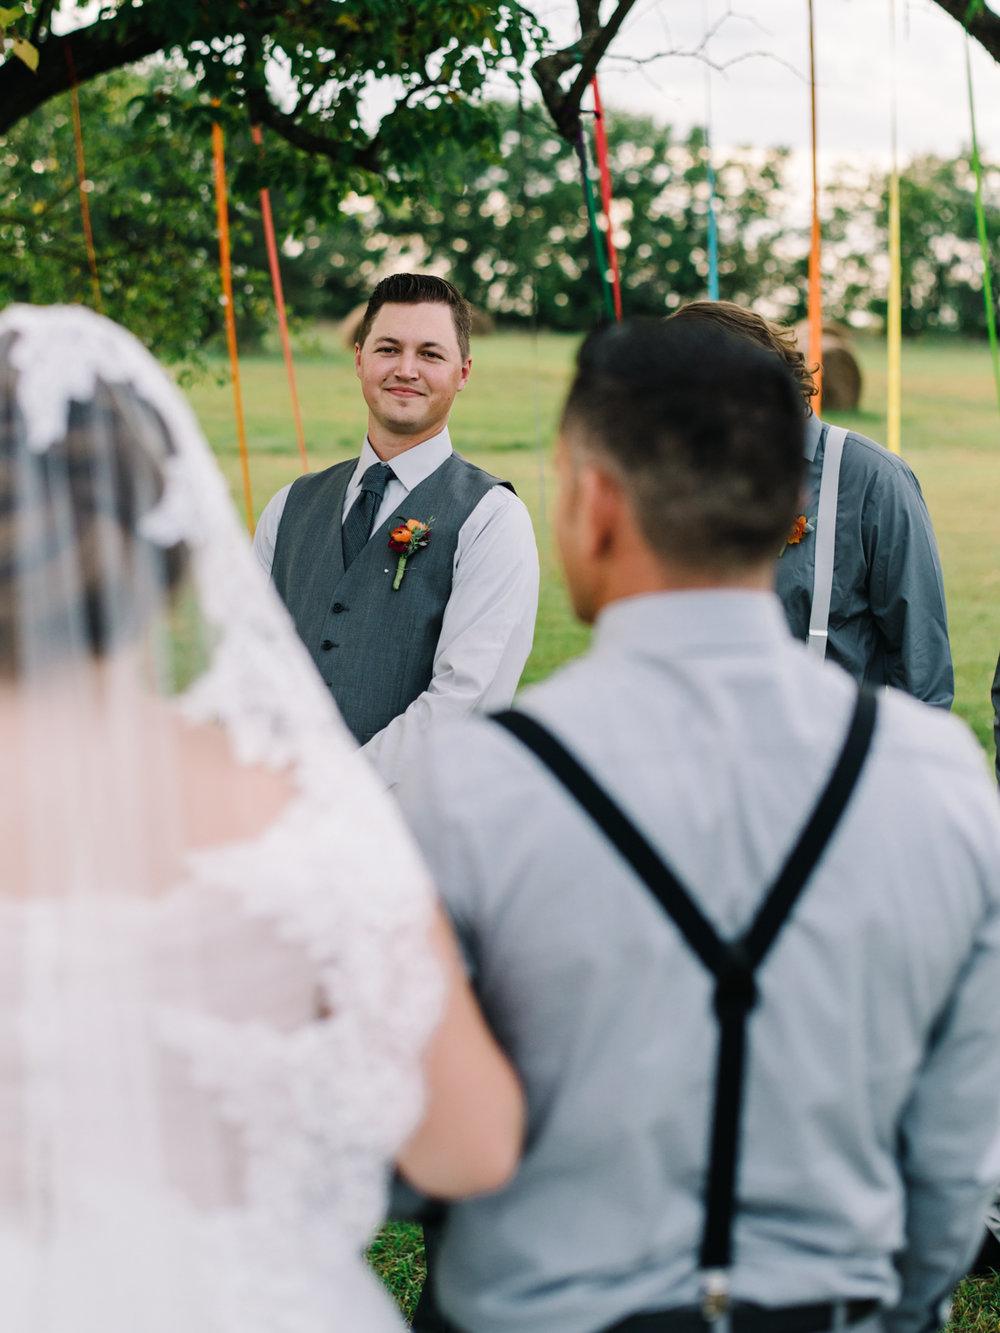 Wichita, Kansas Outdoor Wedding-Neal Dieker-Pinecrest Country Place-Wichita, Kansas Wedding Photographer-211.jpg